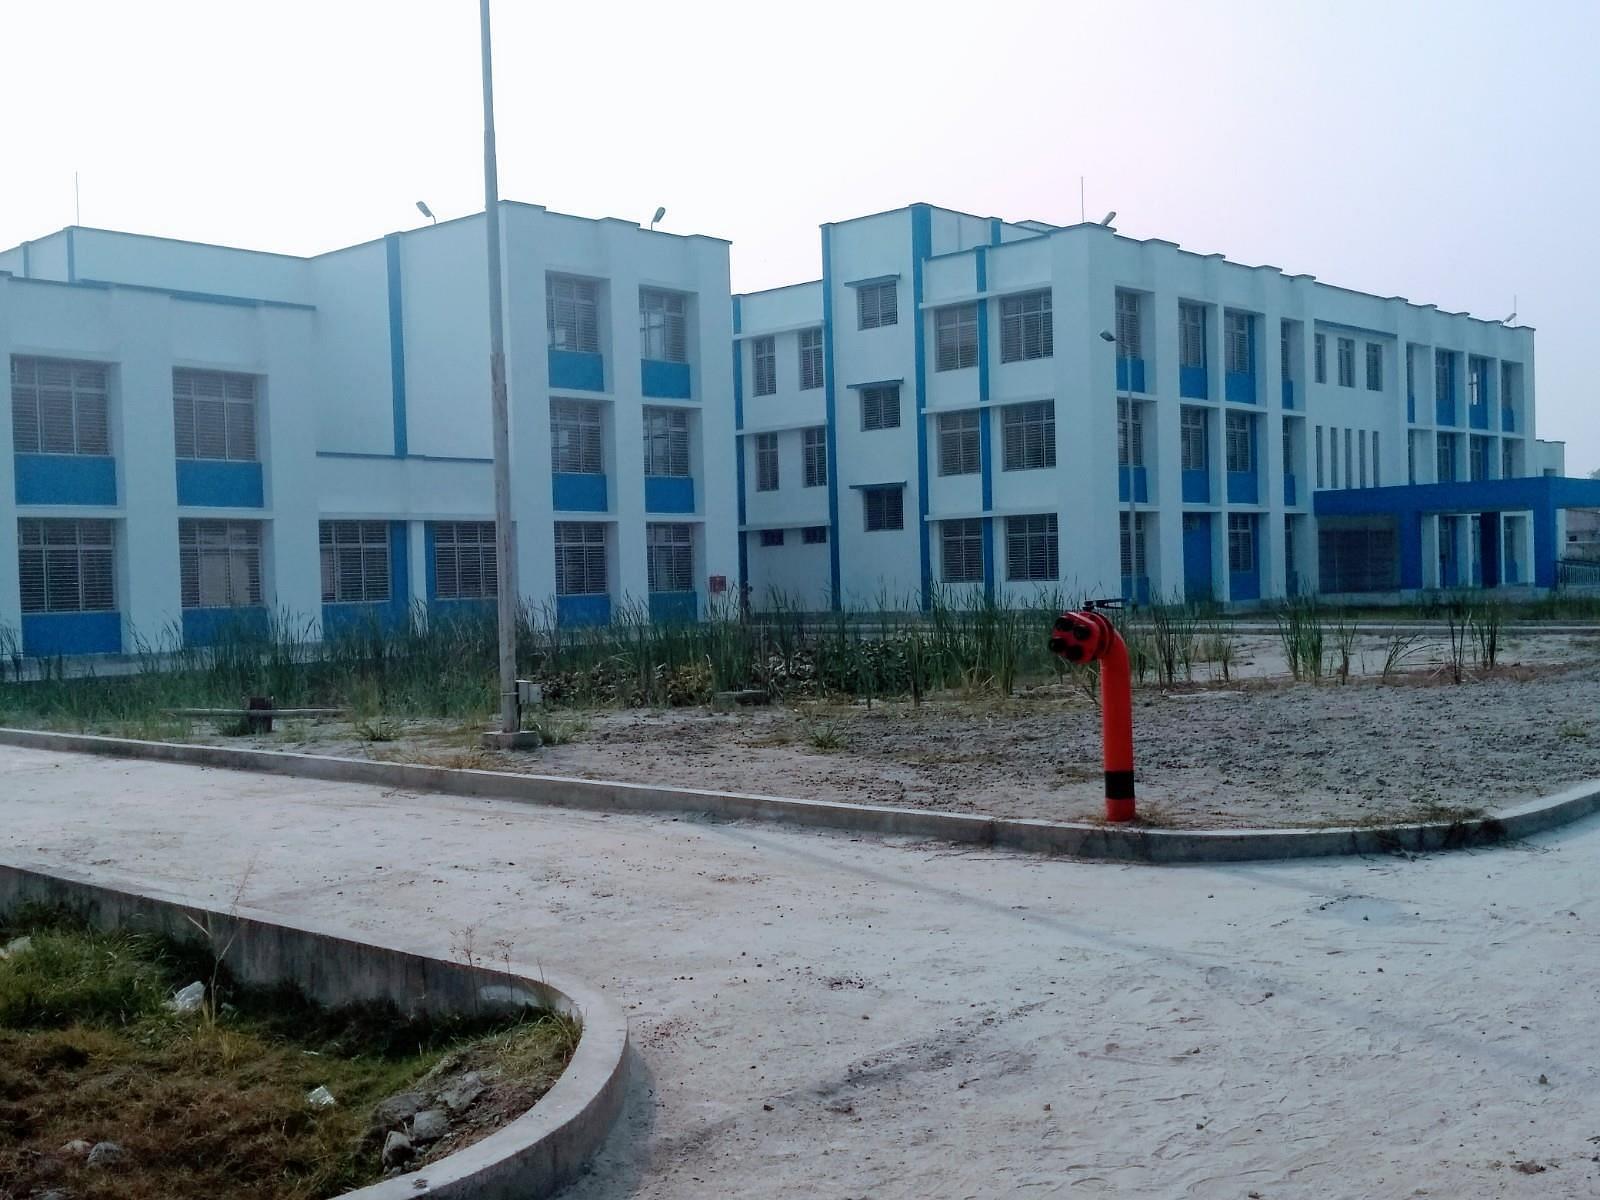 Basirhat Government Polytechnic College